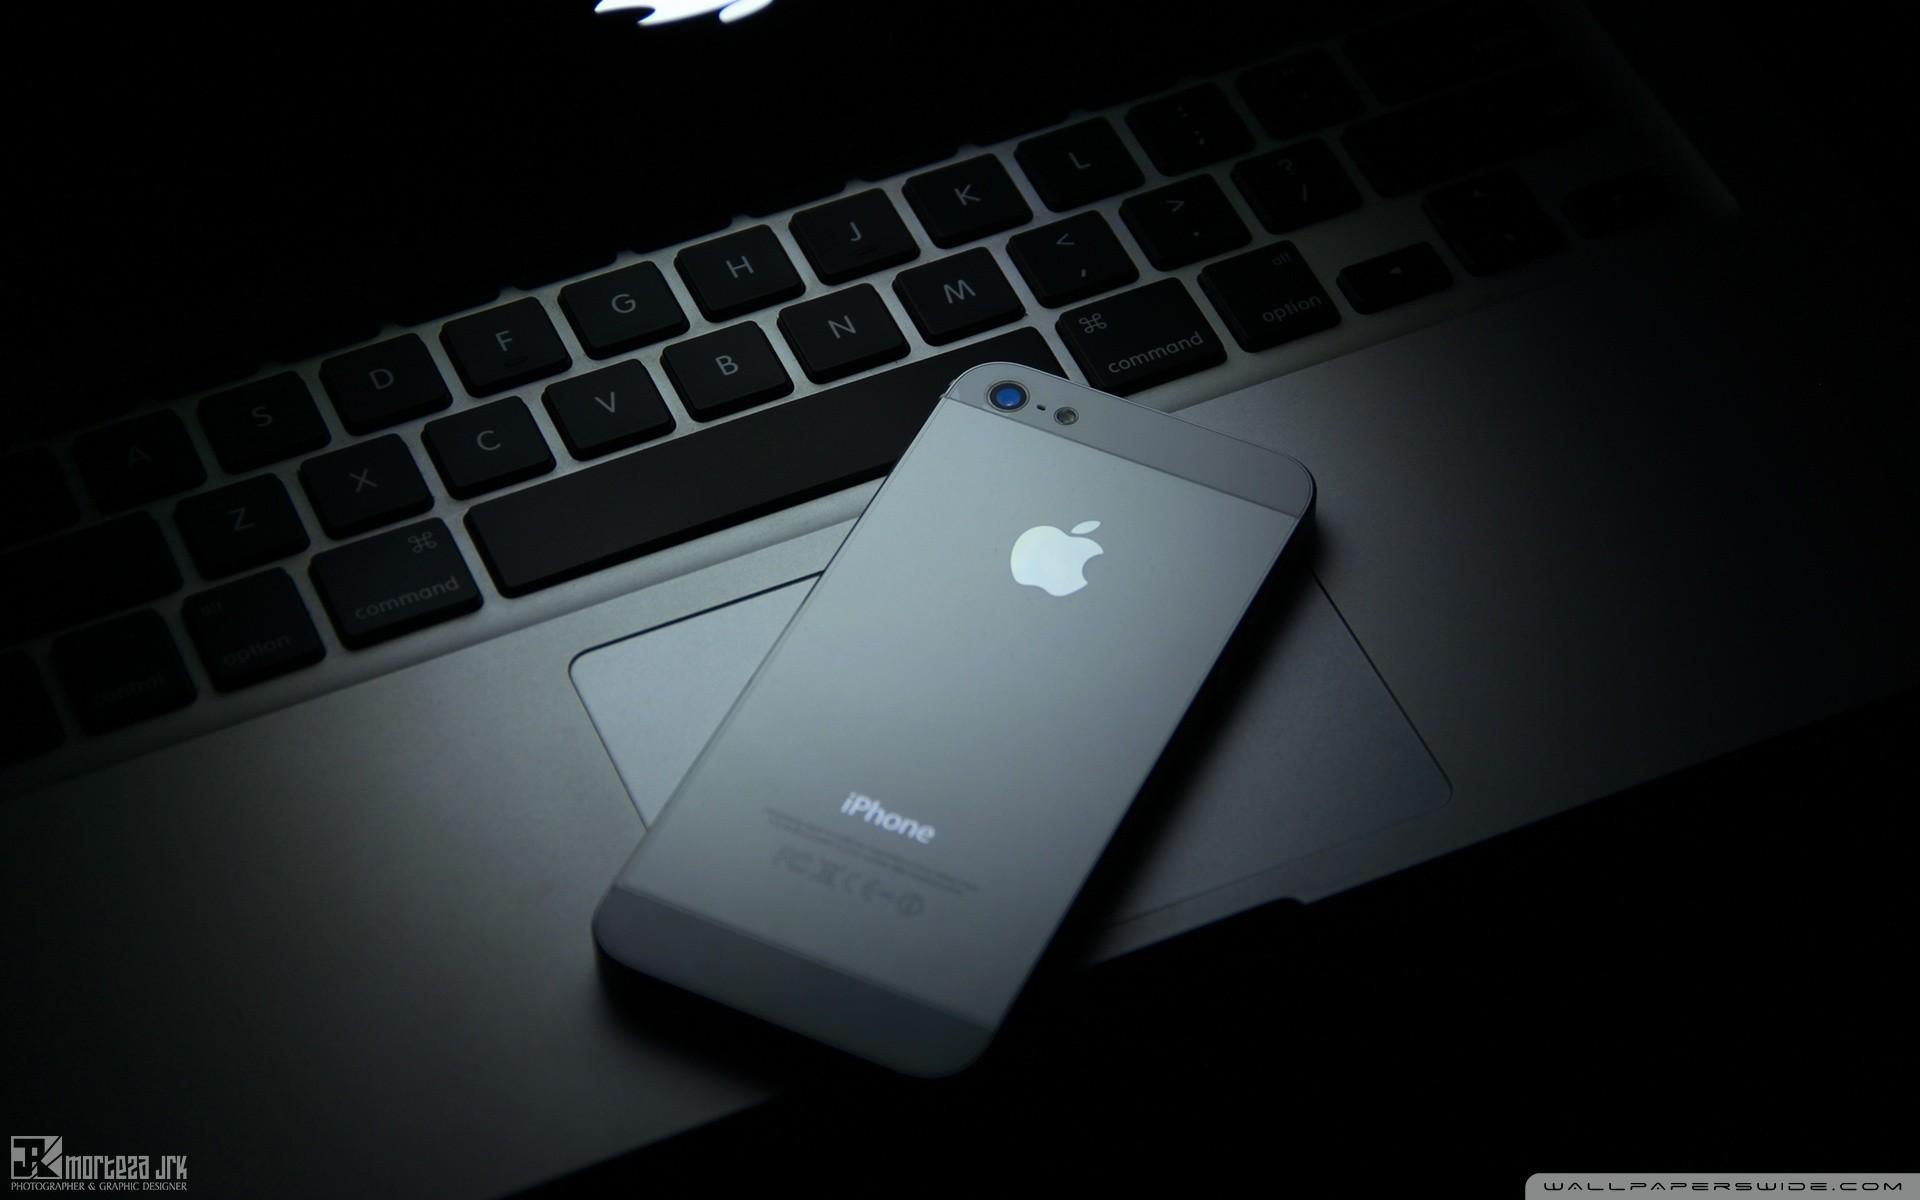 General 1920x1200 iPhone MacBook Apple Inc. technology